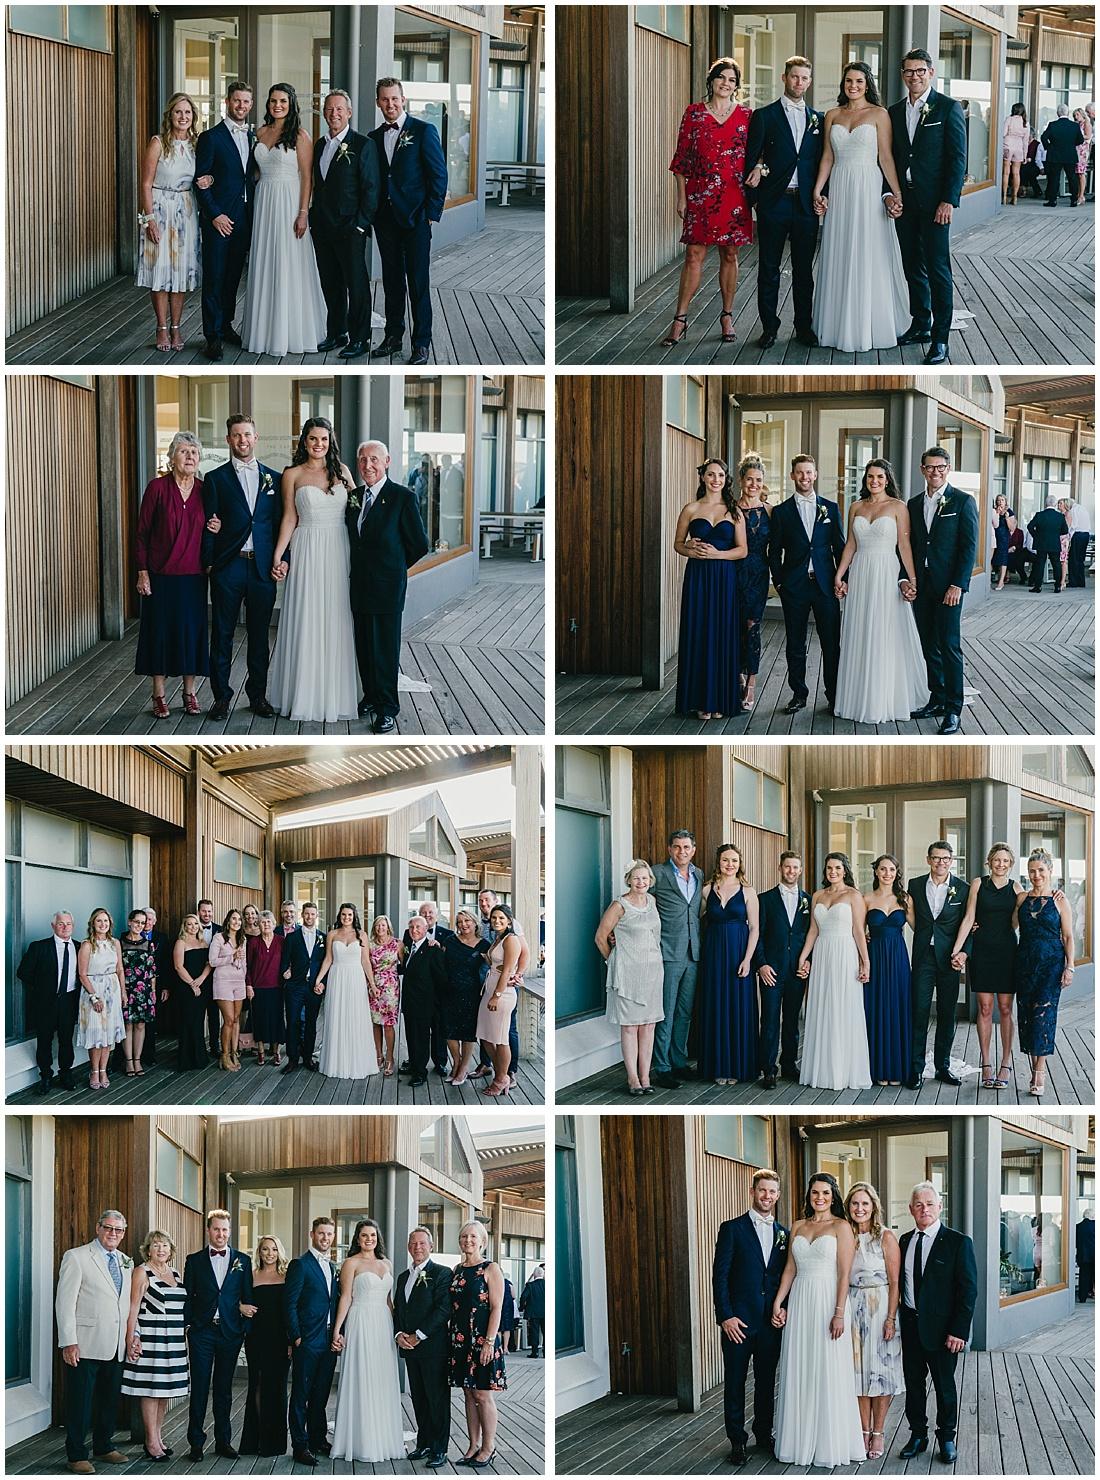 phillip island melbourne wedding photography_0036.jpg